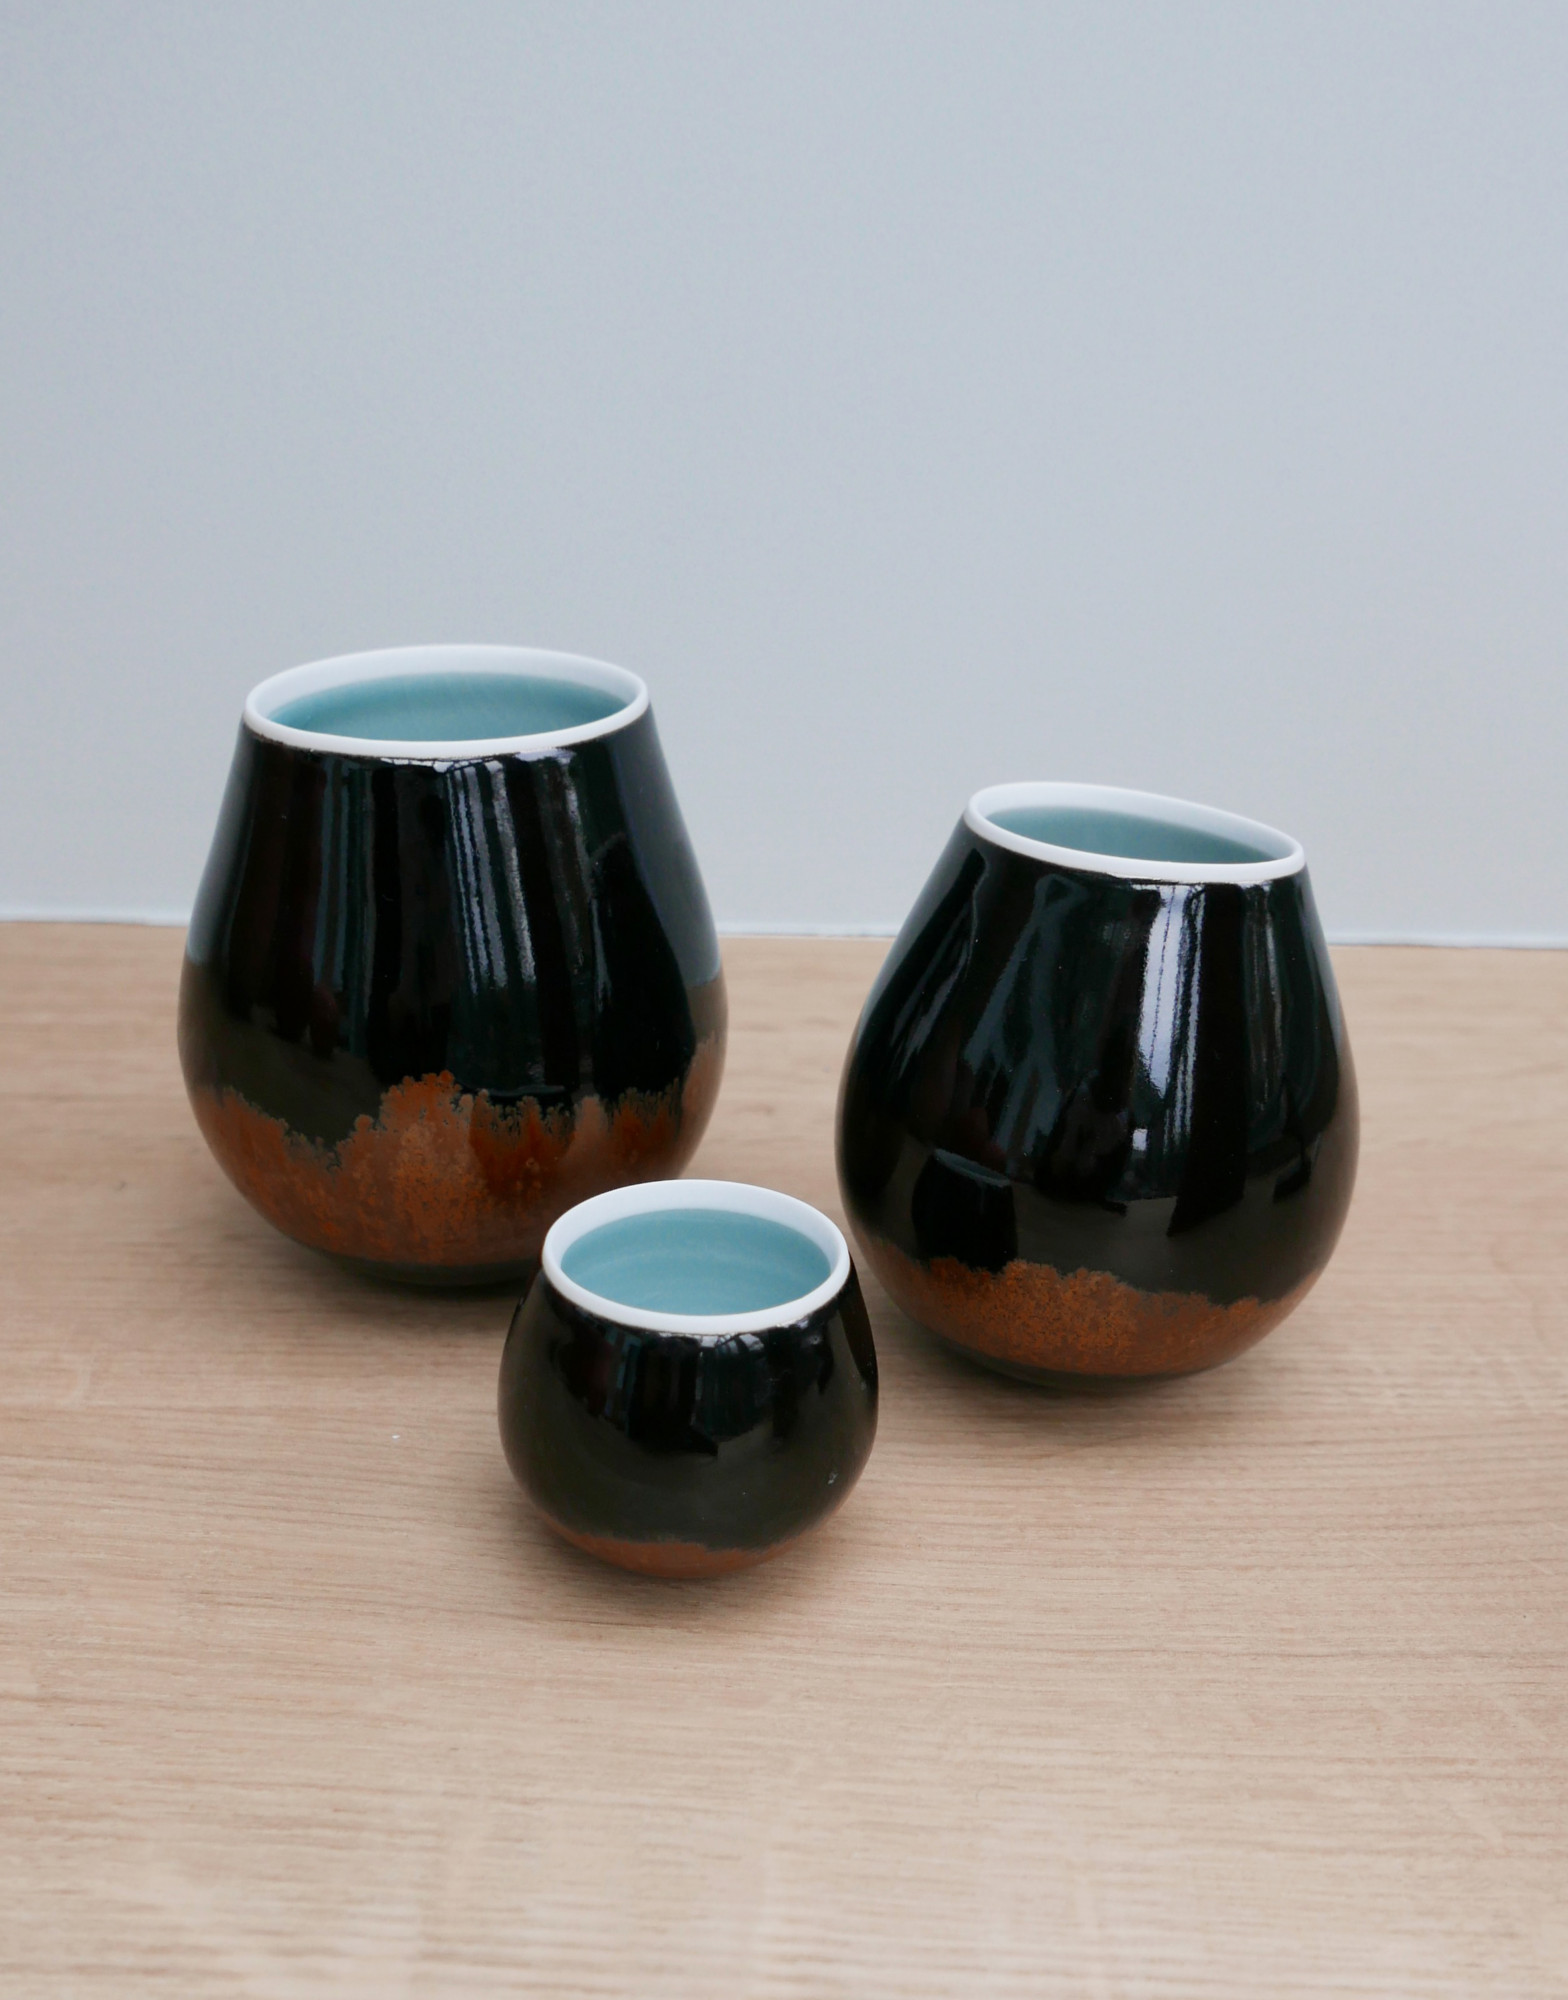 Chris Keenan Rocking Bowls at Joanna Bird Contemporary Collections